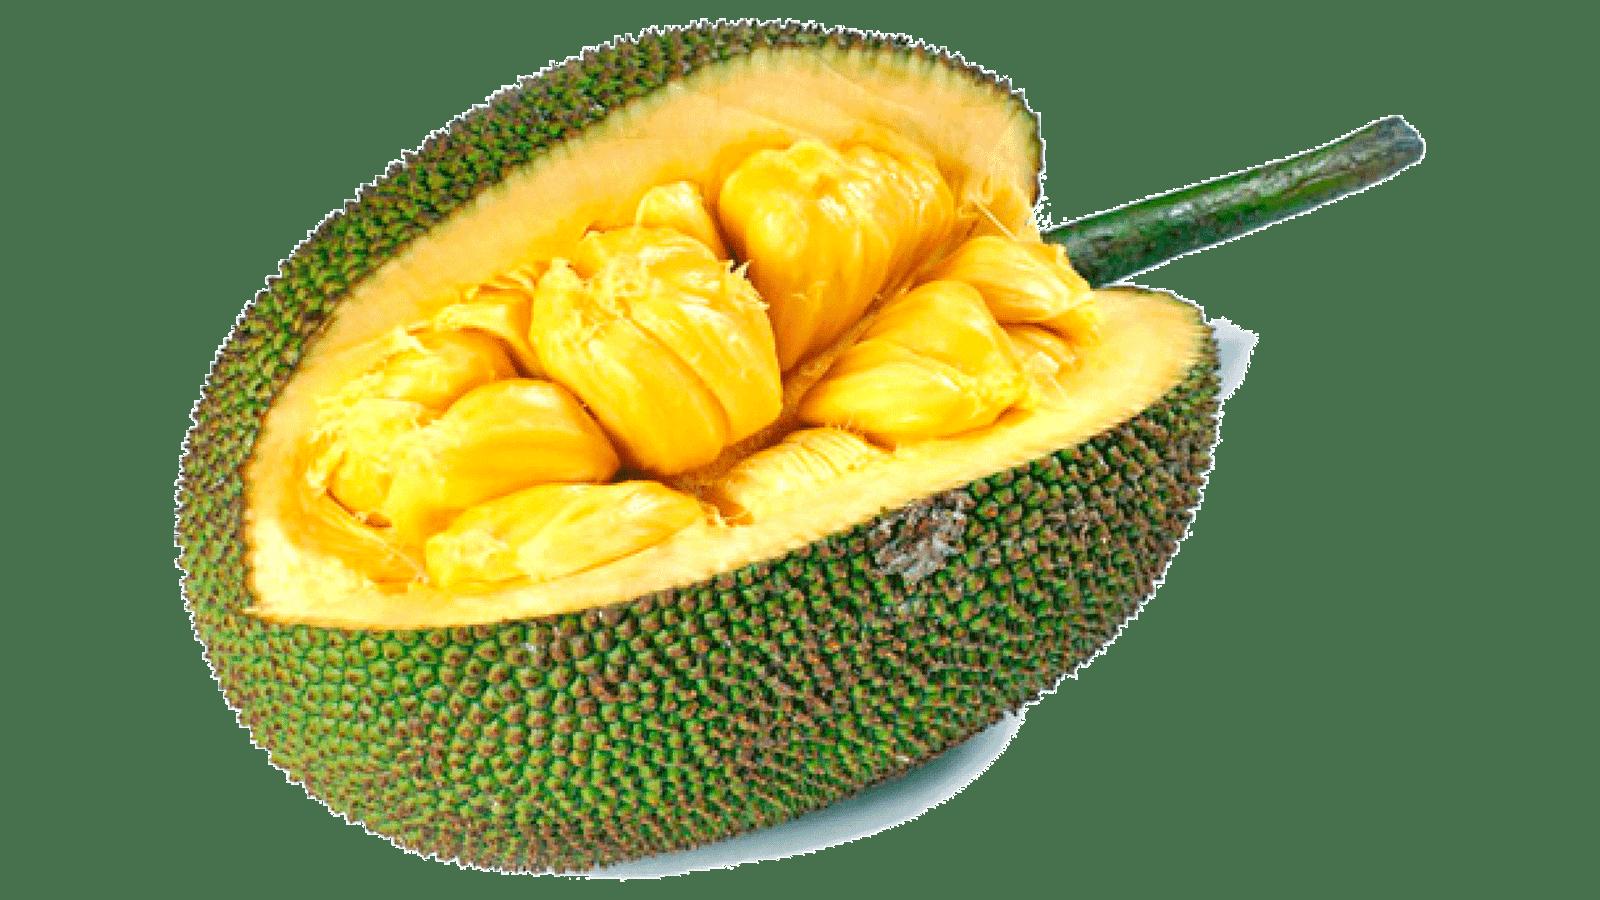 Jackfruit cempedak food nutrient. Tree clipart jack fruit